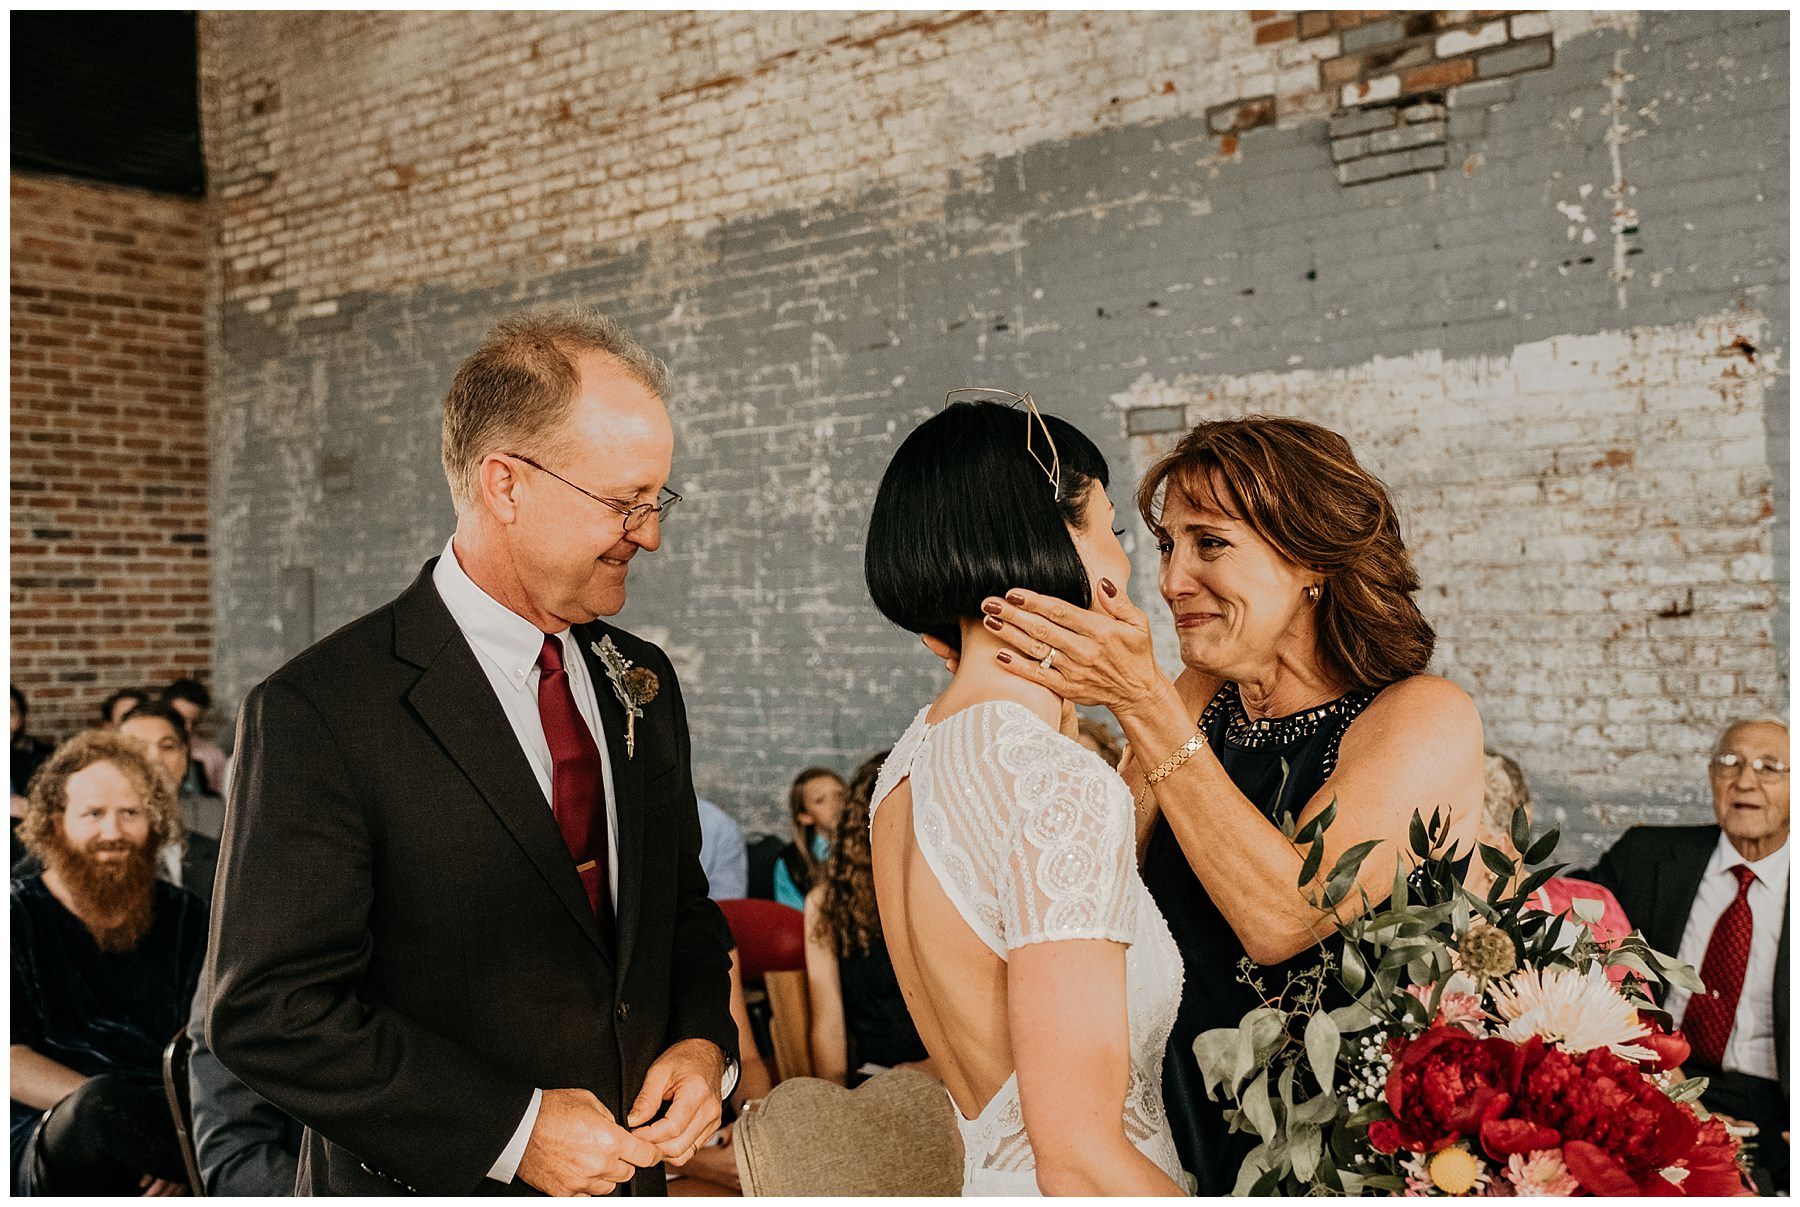 Jon and Jen New York Wedding-108.jpg